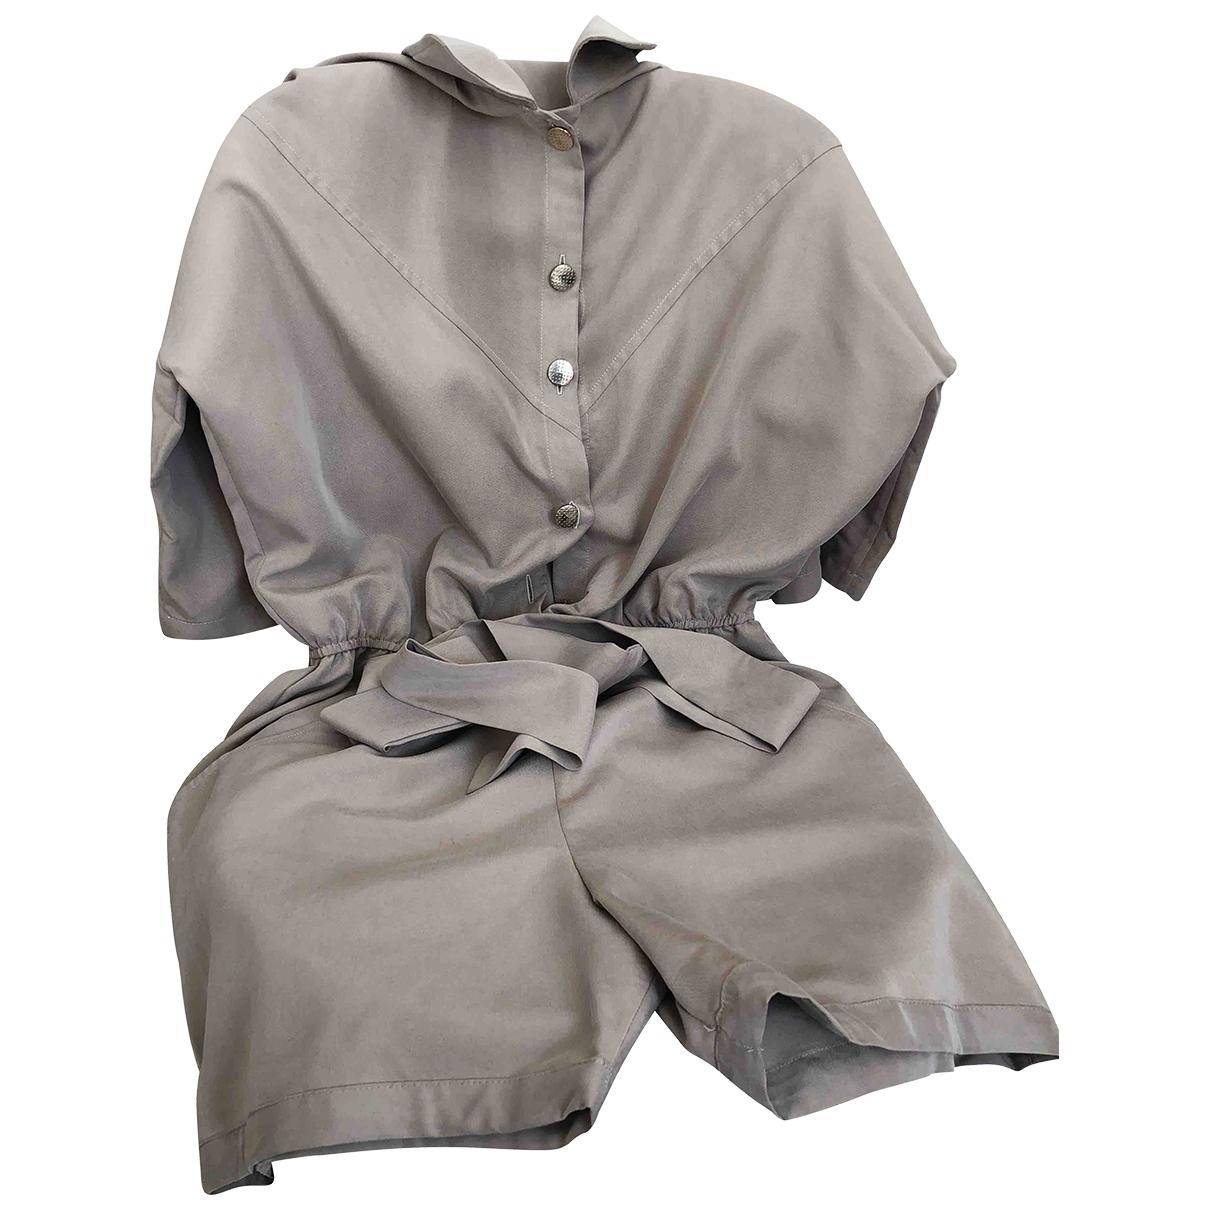 Carolina Ritz \N Beige Shorts for Women 38 FR